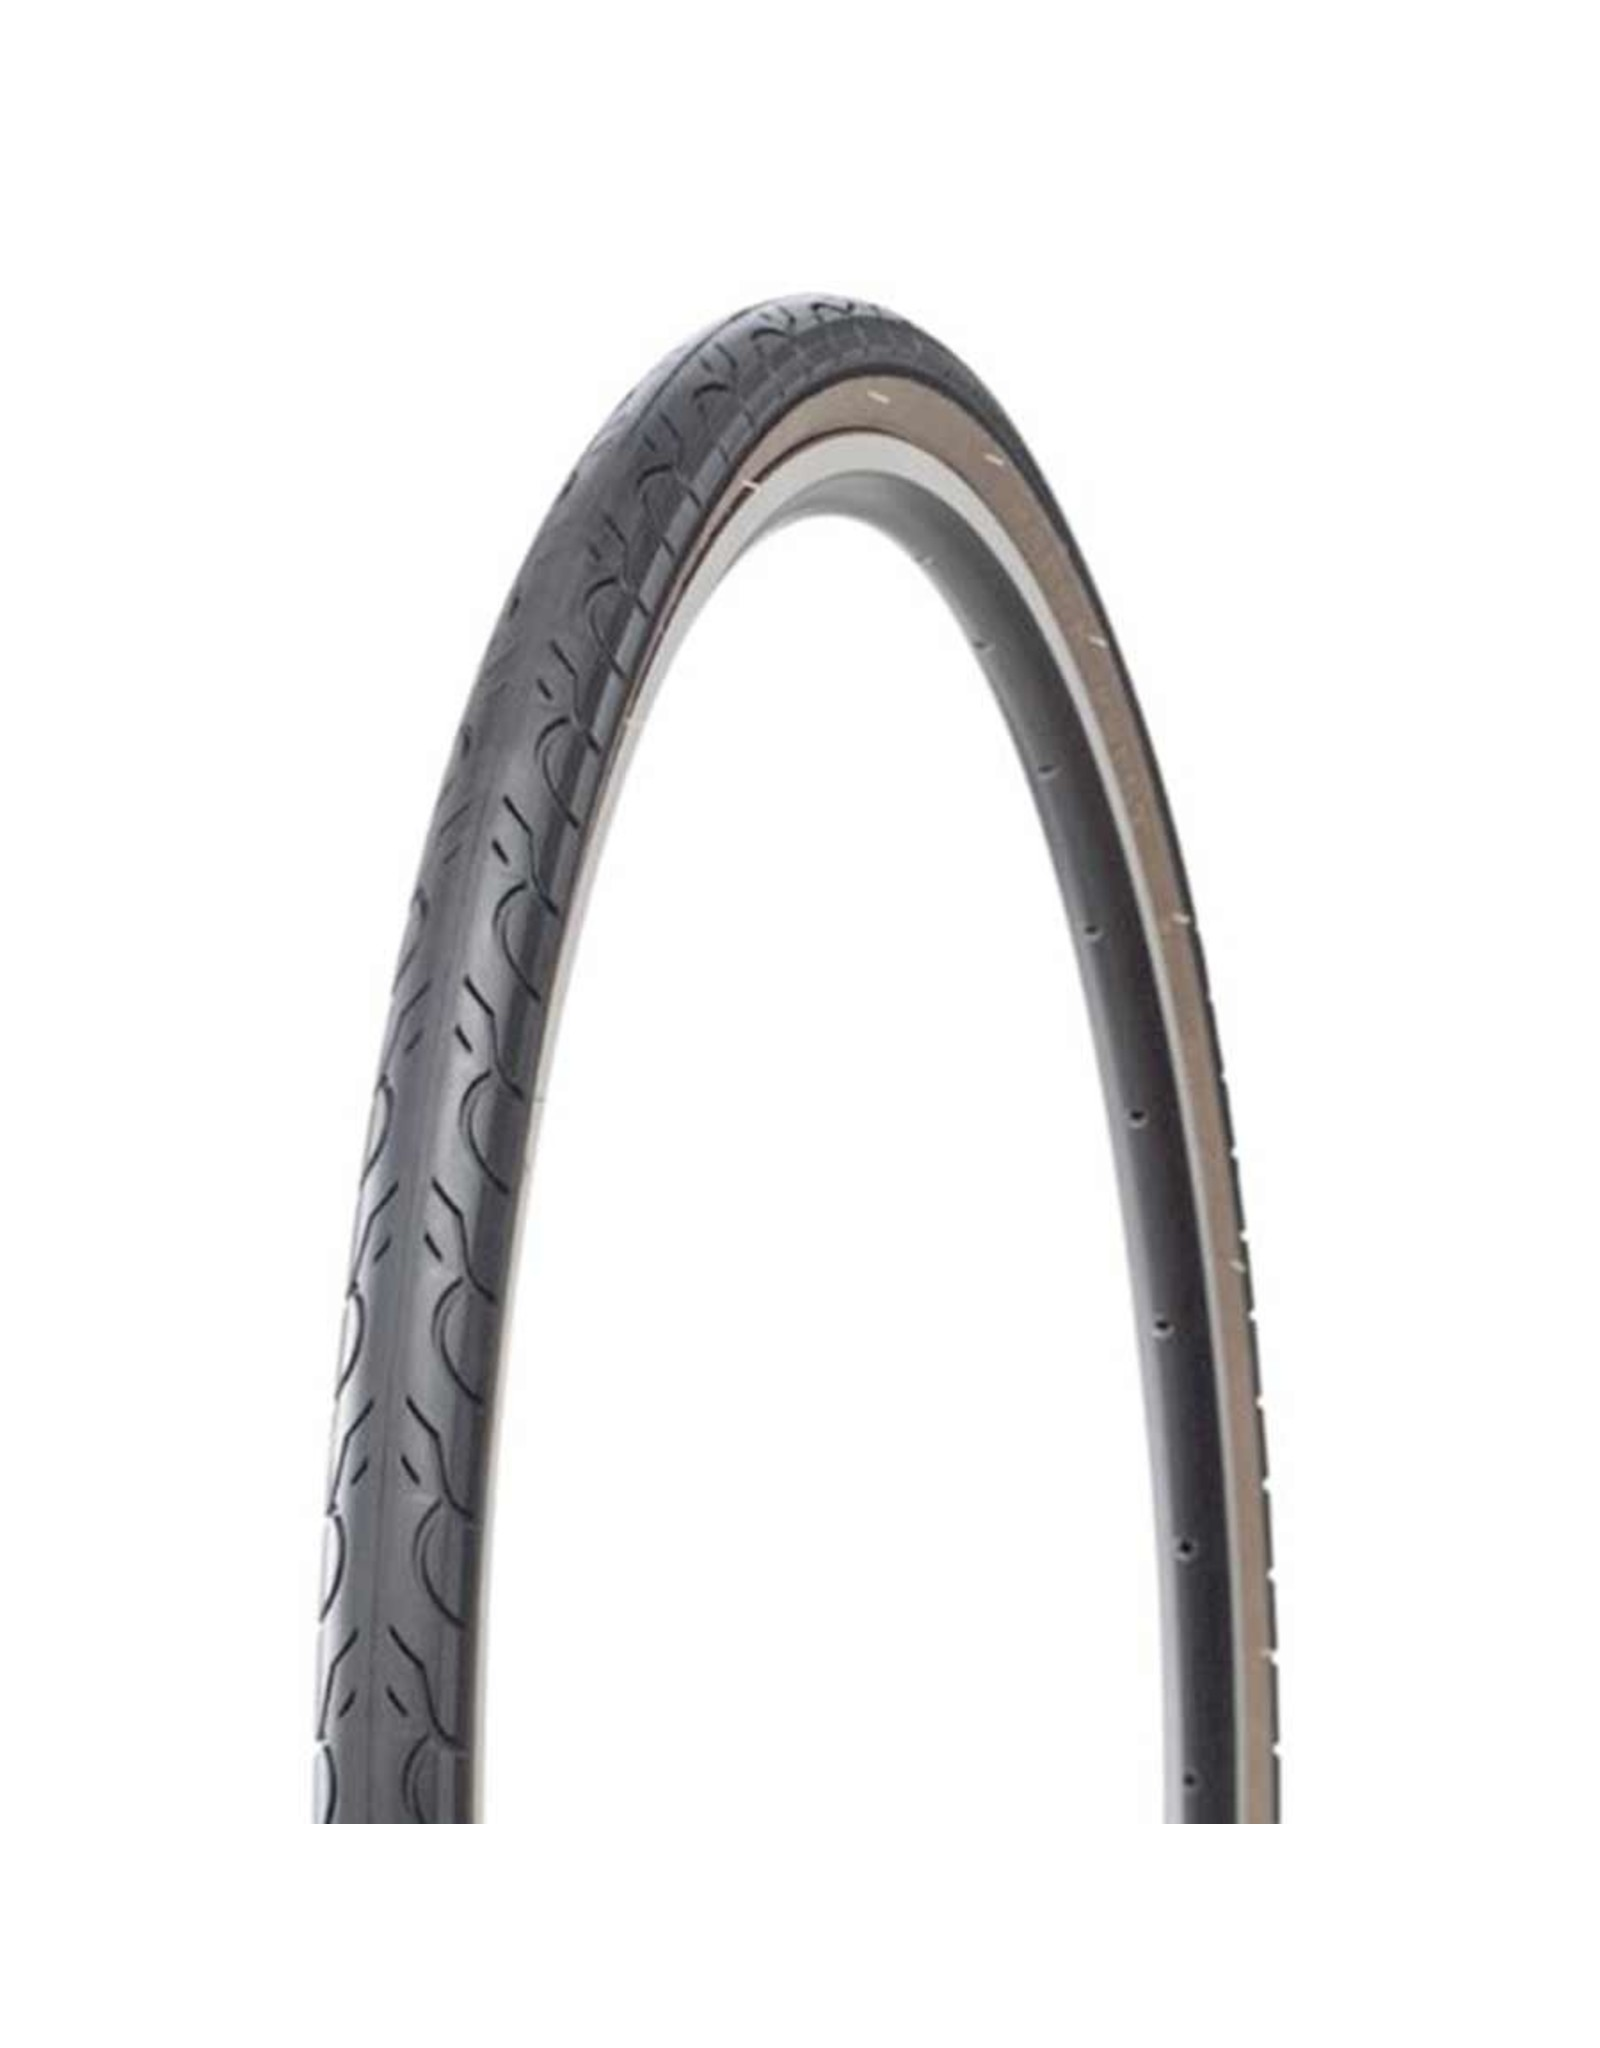 Kenda Kenda, Kwest K193, Tire, 700x38C, Wire, Clincher, Single, 30TPI, Black